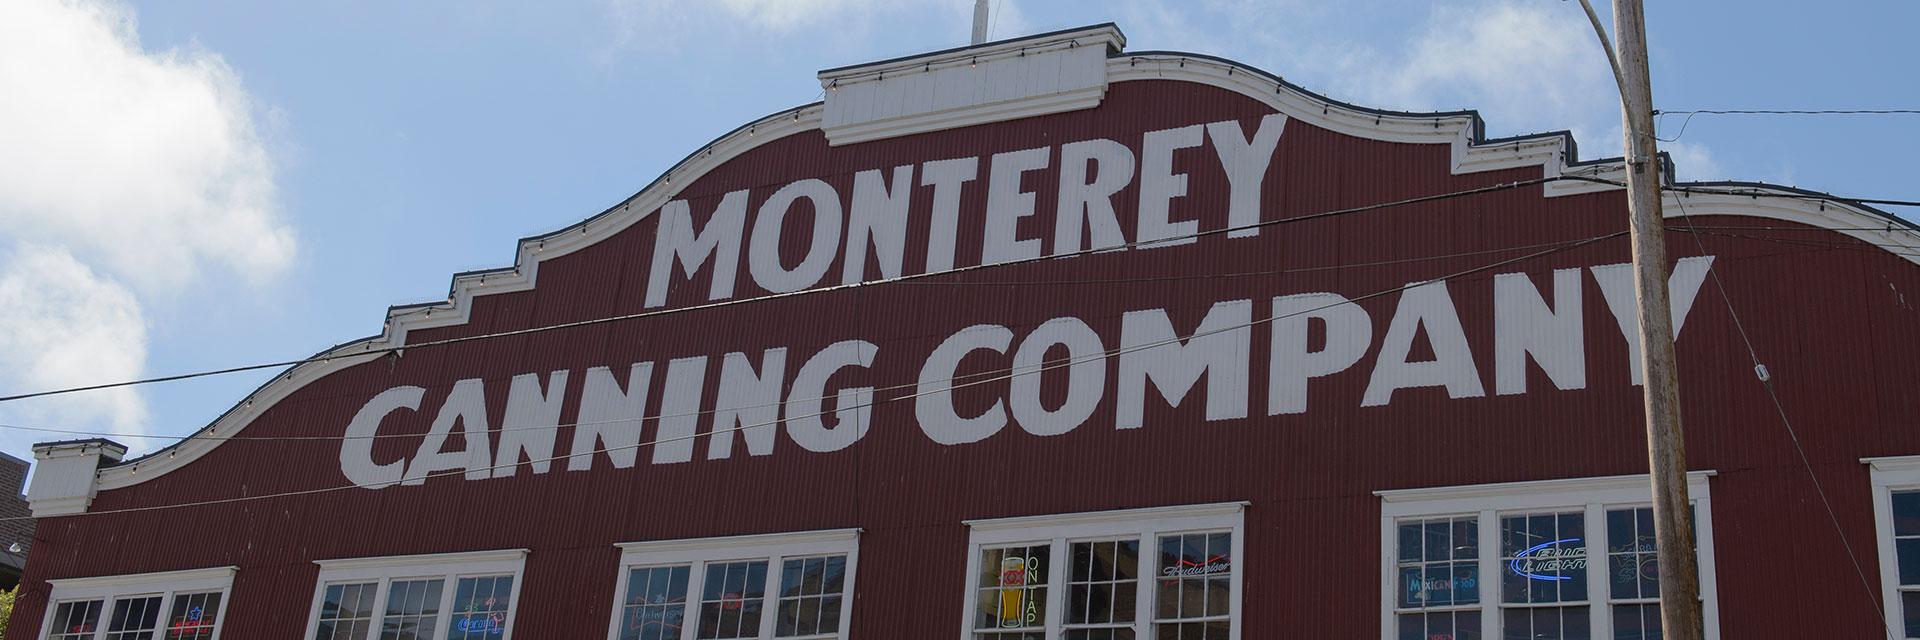 Location Of Wave Street Inn Monterey California